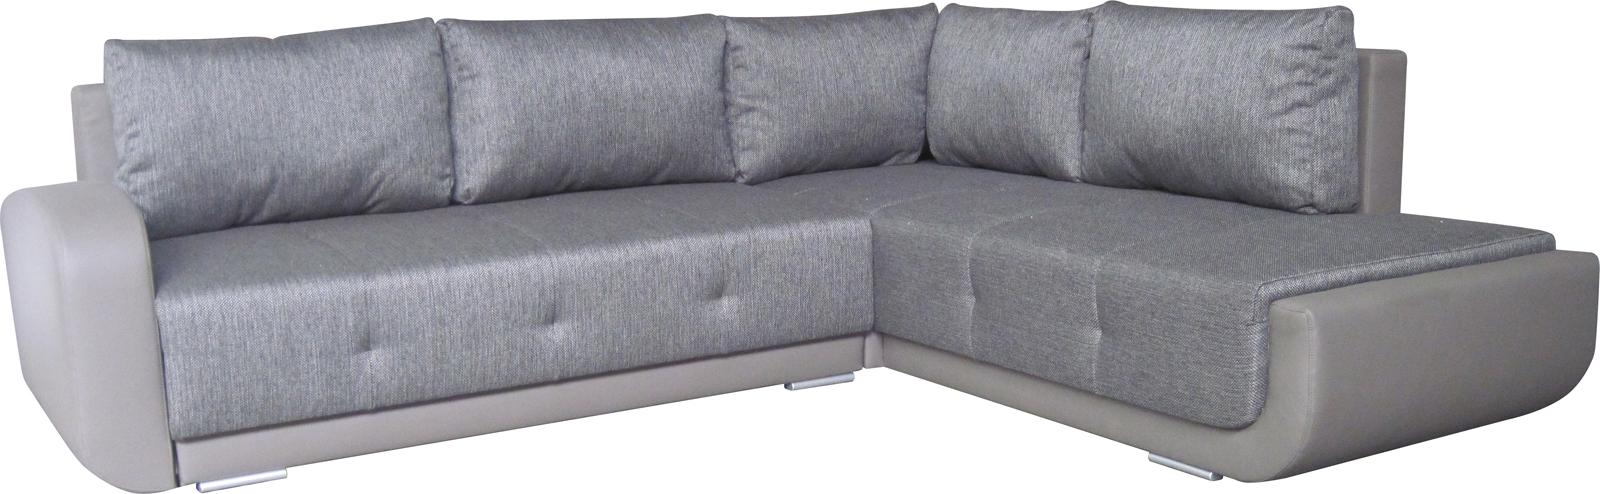 Rohová sedačka - BRW - Swing Lux 3DL.REC šedá (P)